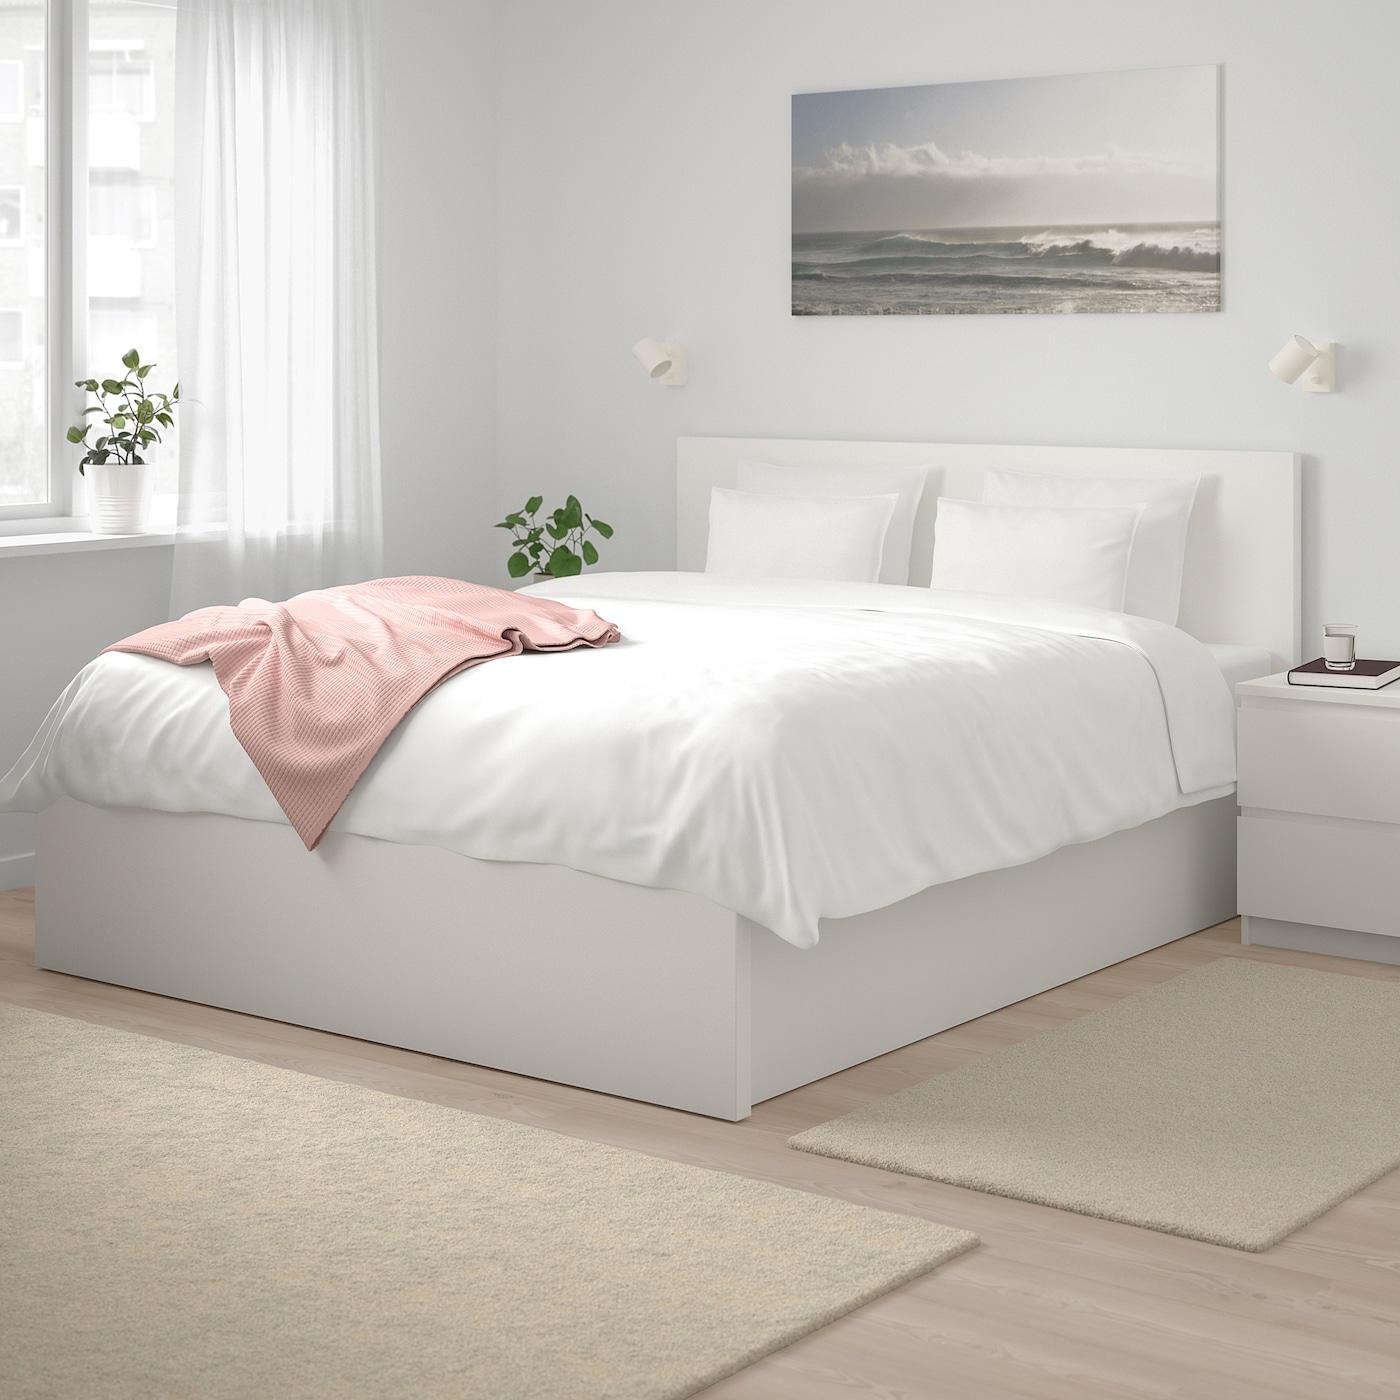 MALM Ottoman bed - white 4x4 cm